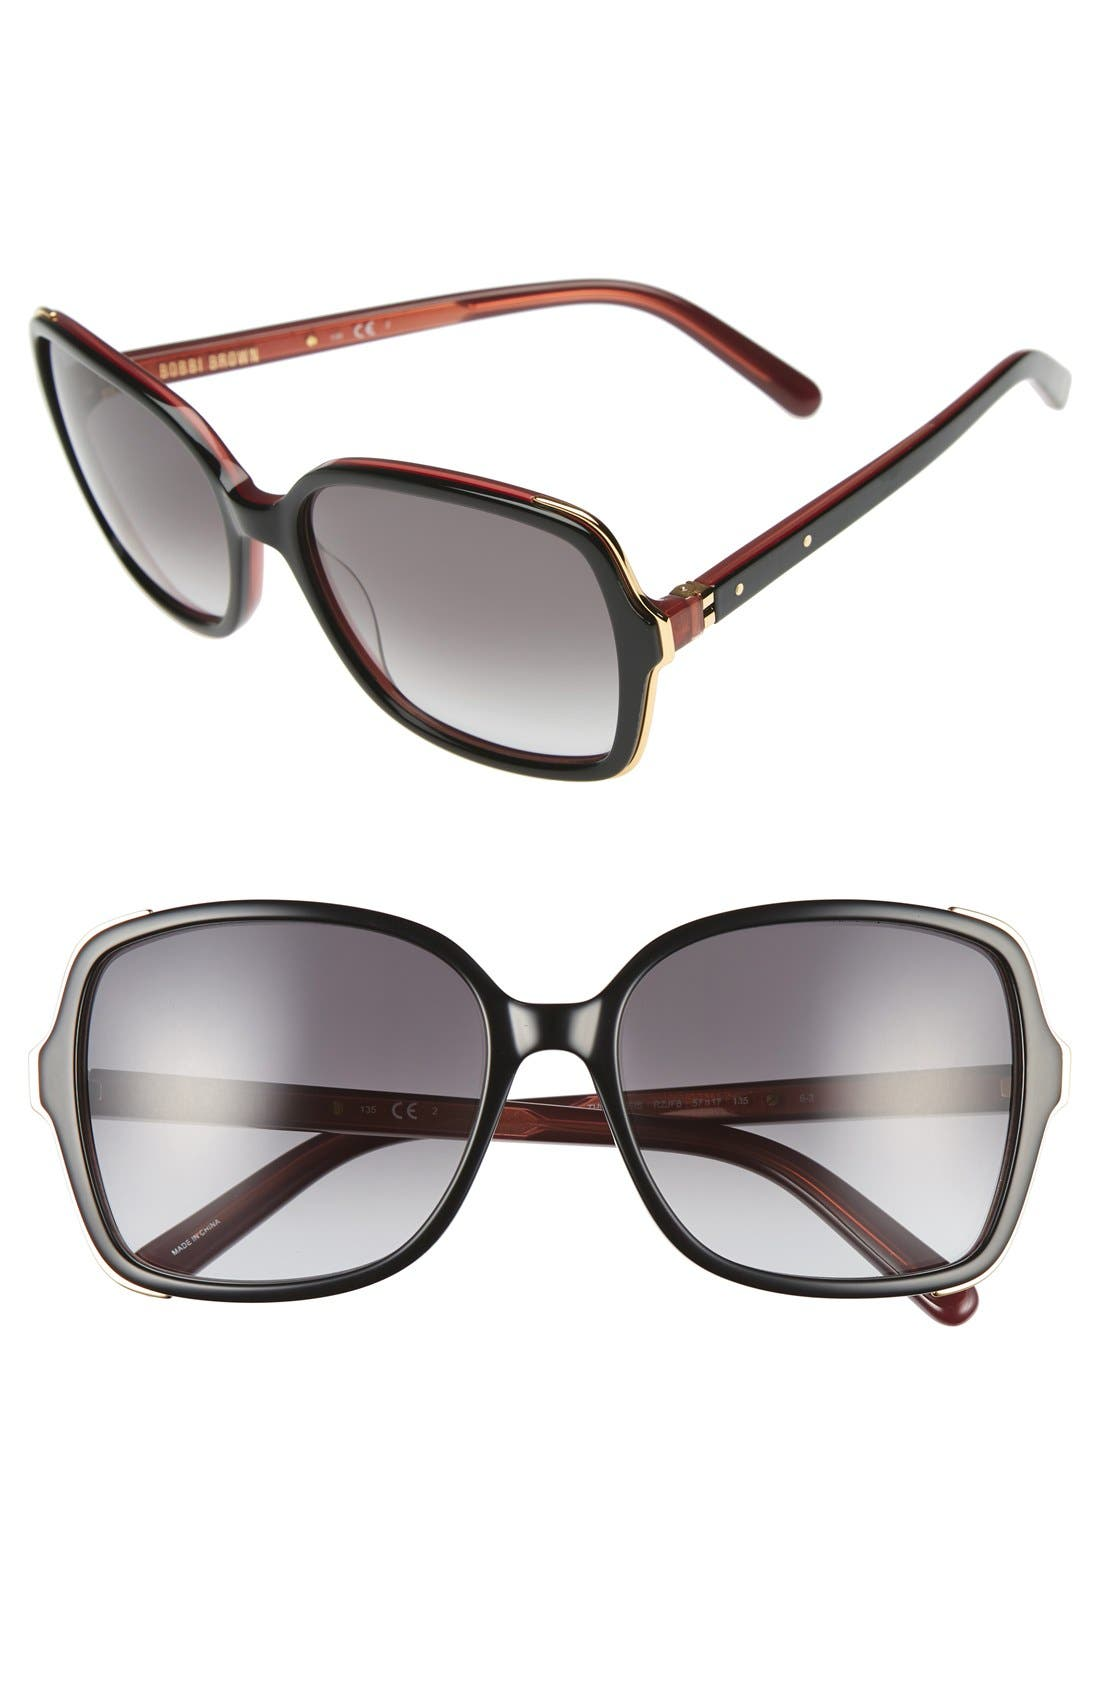 Main Image - Bobbi Brown 'The Alice' 57mm Sunglasses